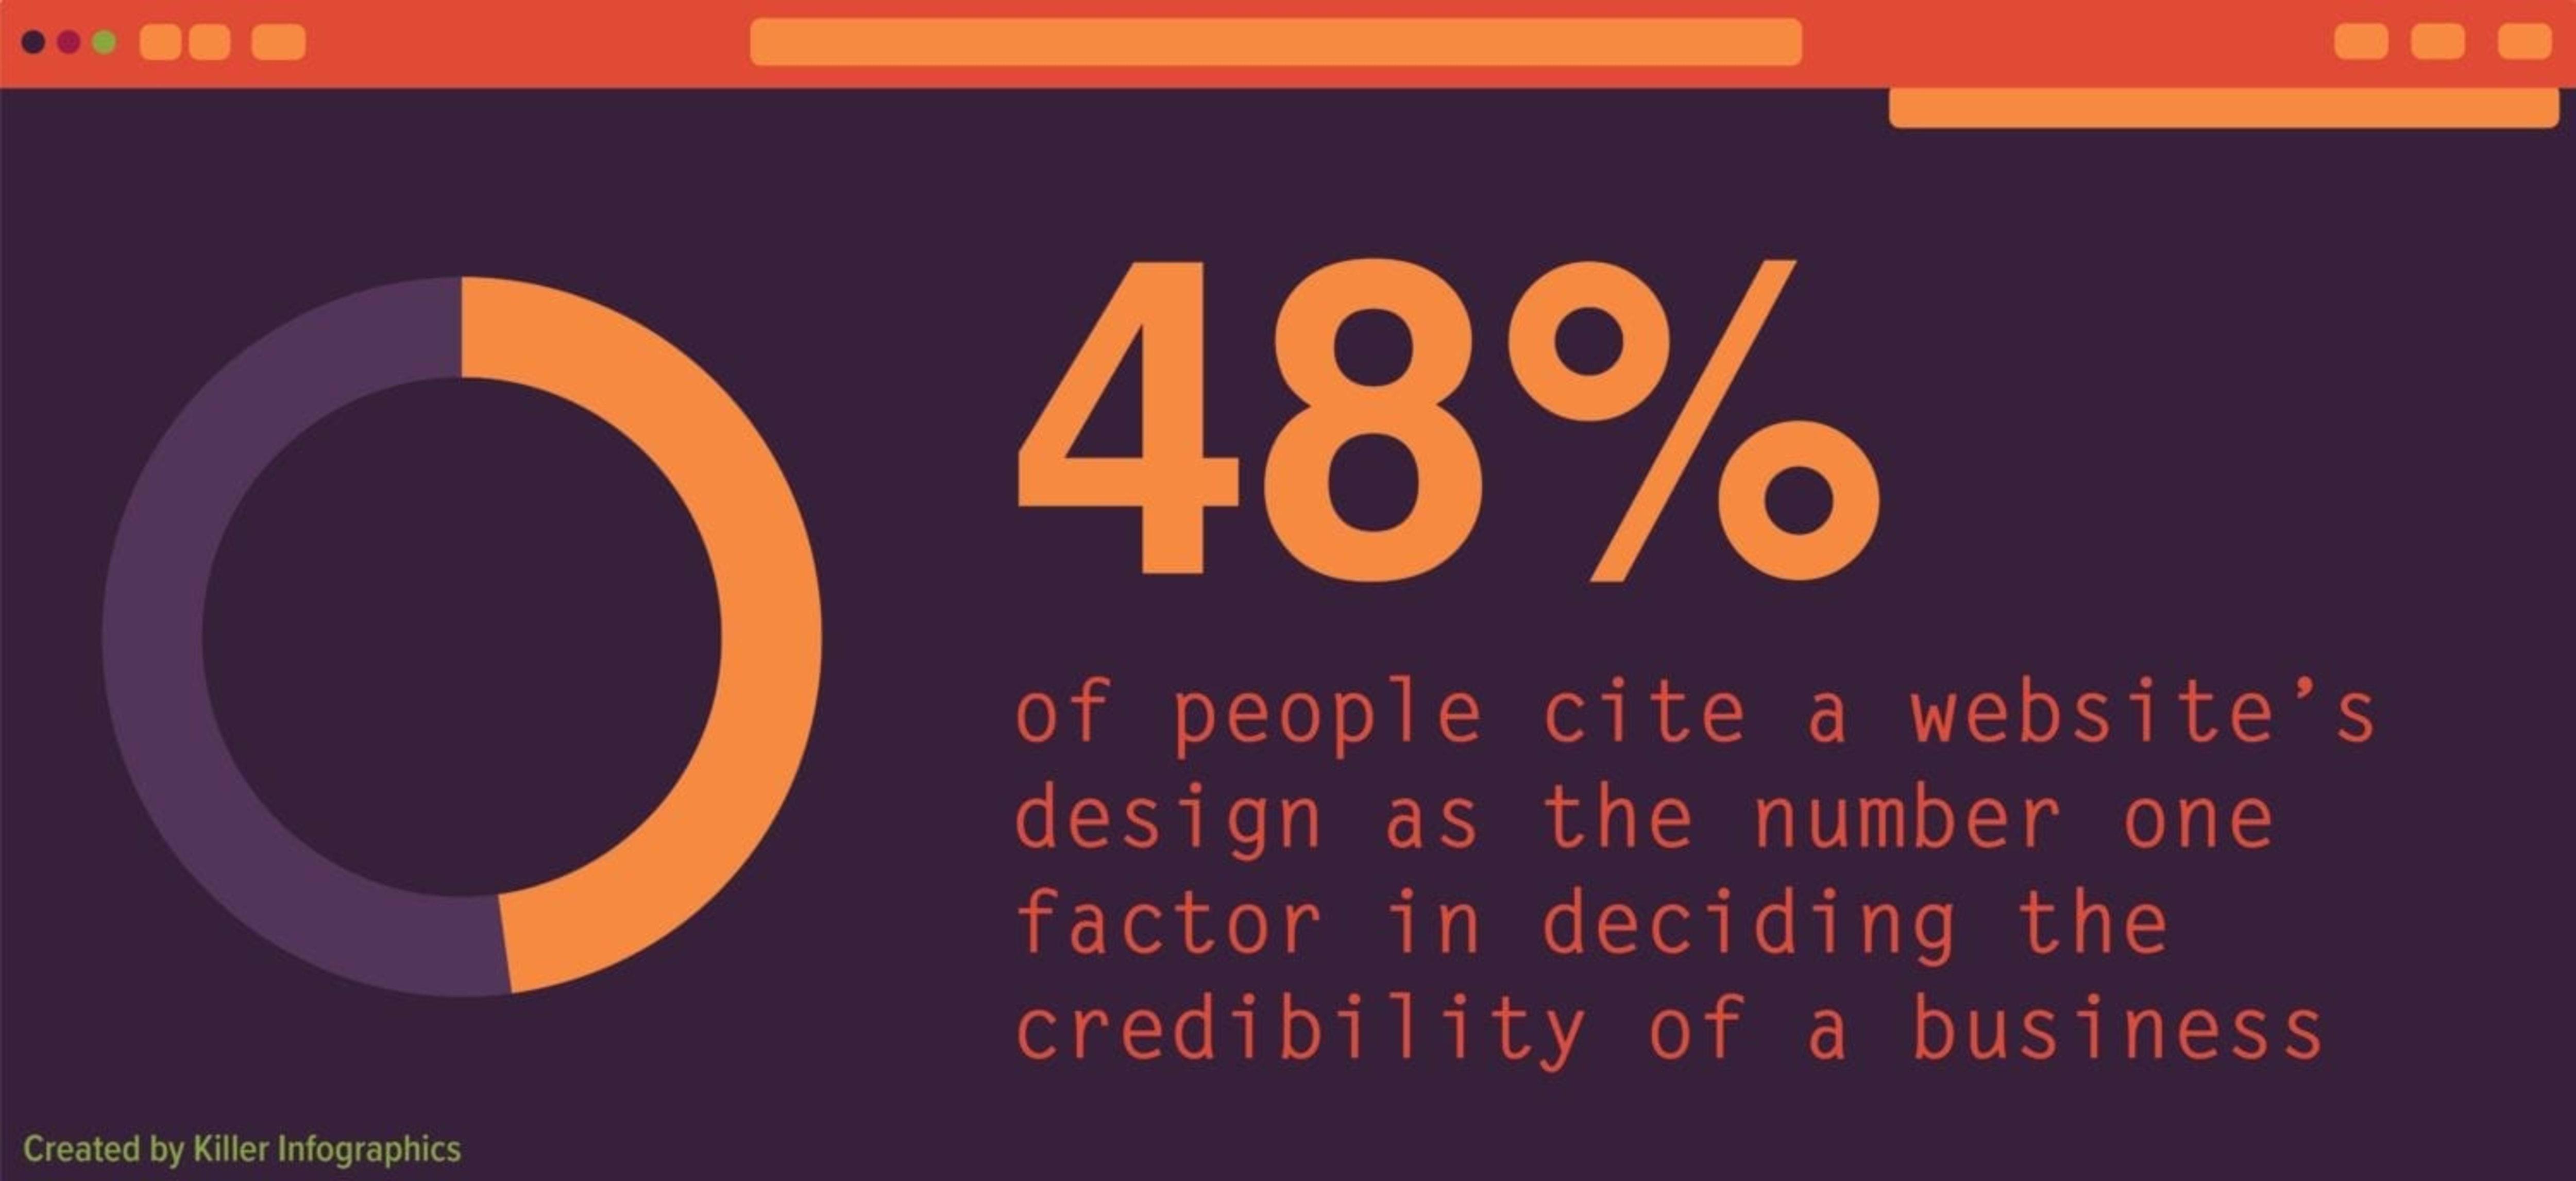 ux blog asset dataviz 48 percent site design number one credibility factor